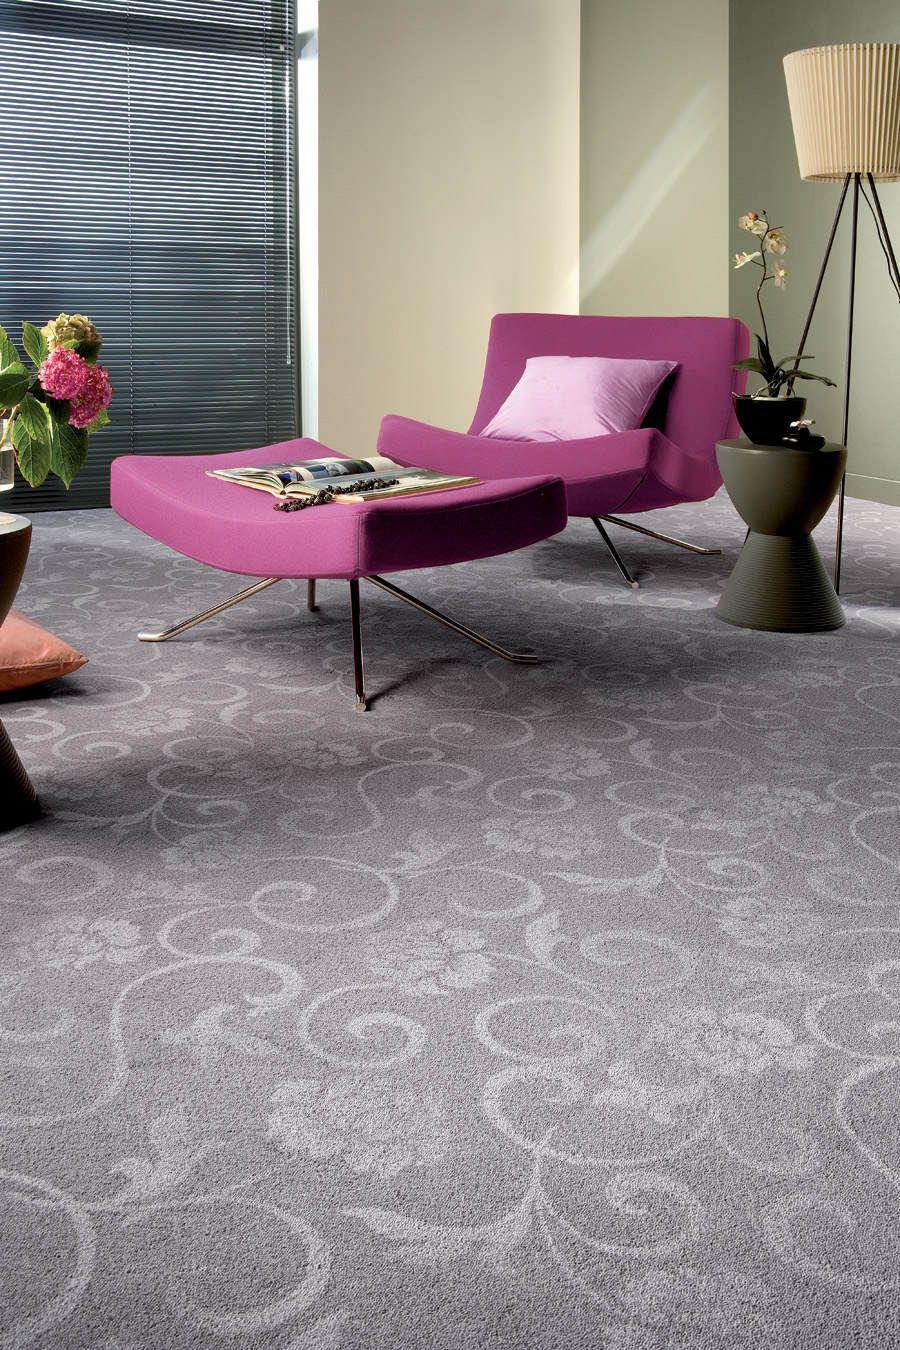 Grey Carpet Contemporary Ideas Living Room Carpet How To Clean Carpet Affordable Carpet